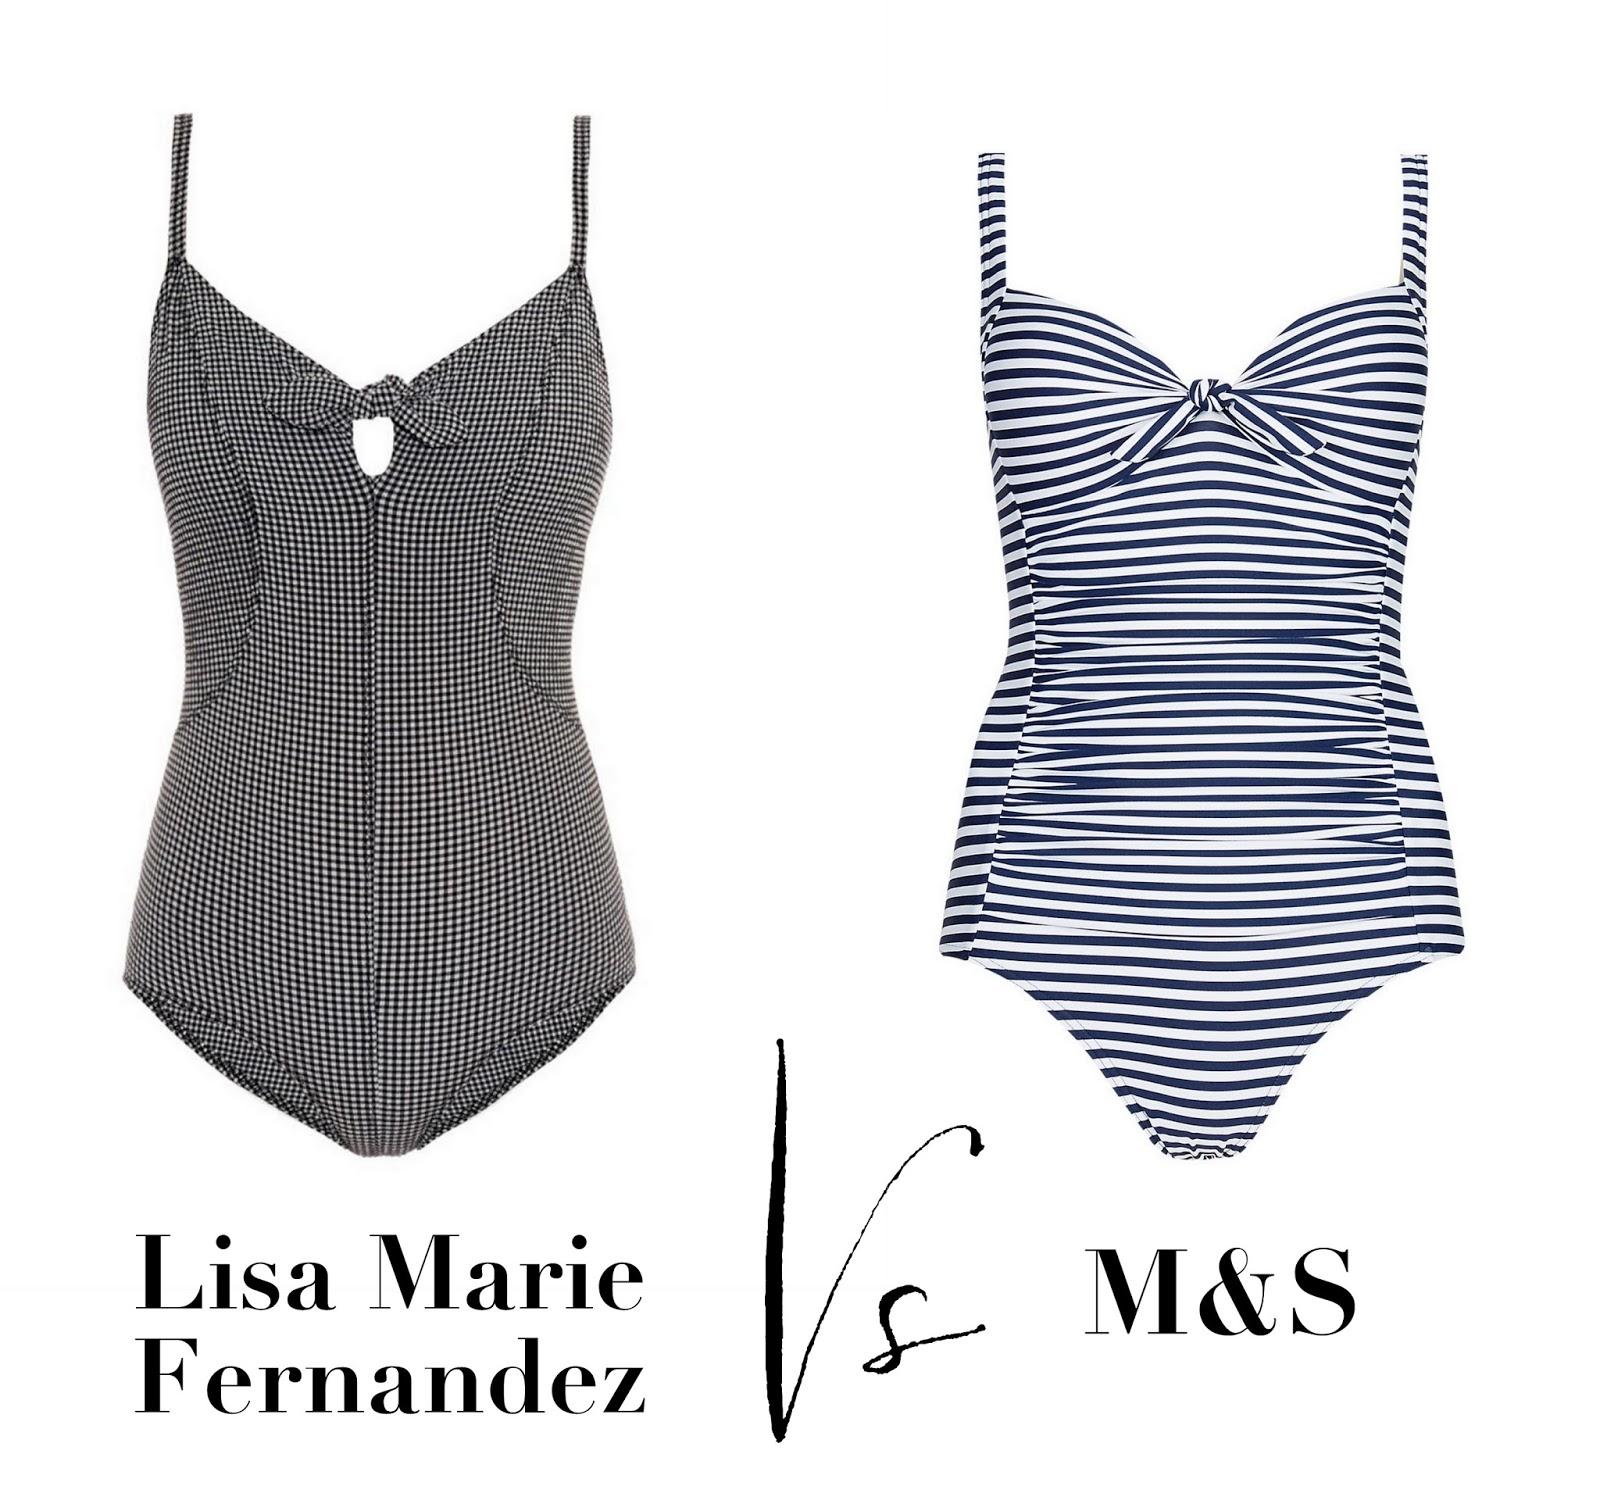 e594540b0a Lisa Marie Fernandez 'Poppy' swimsuit: £300, Matches Fashion. Striped  swimsuit, £26, Marks & Spencer